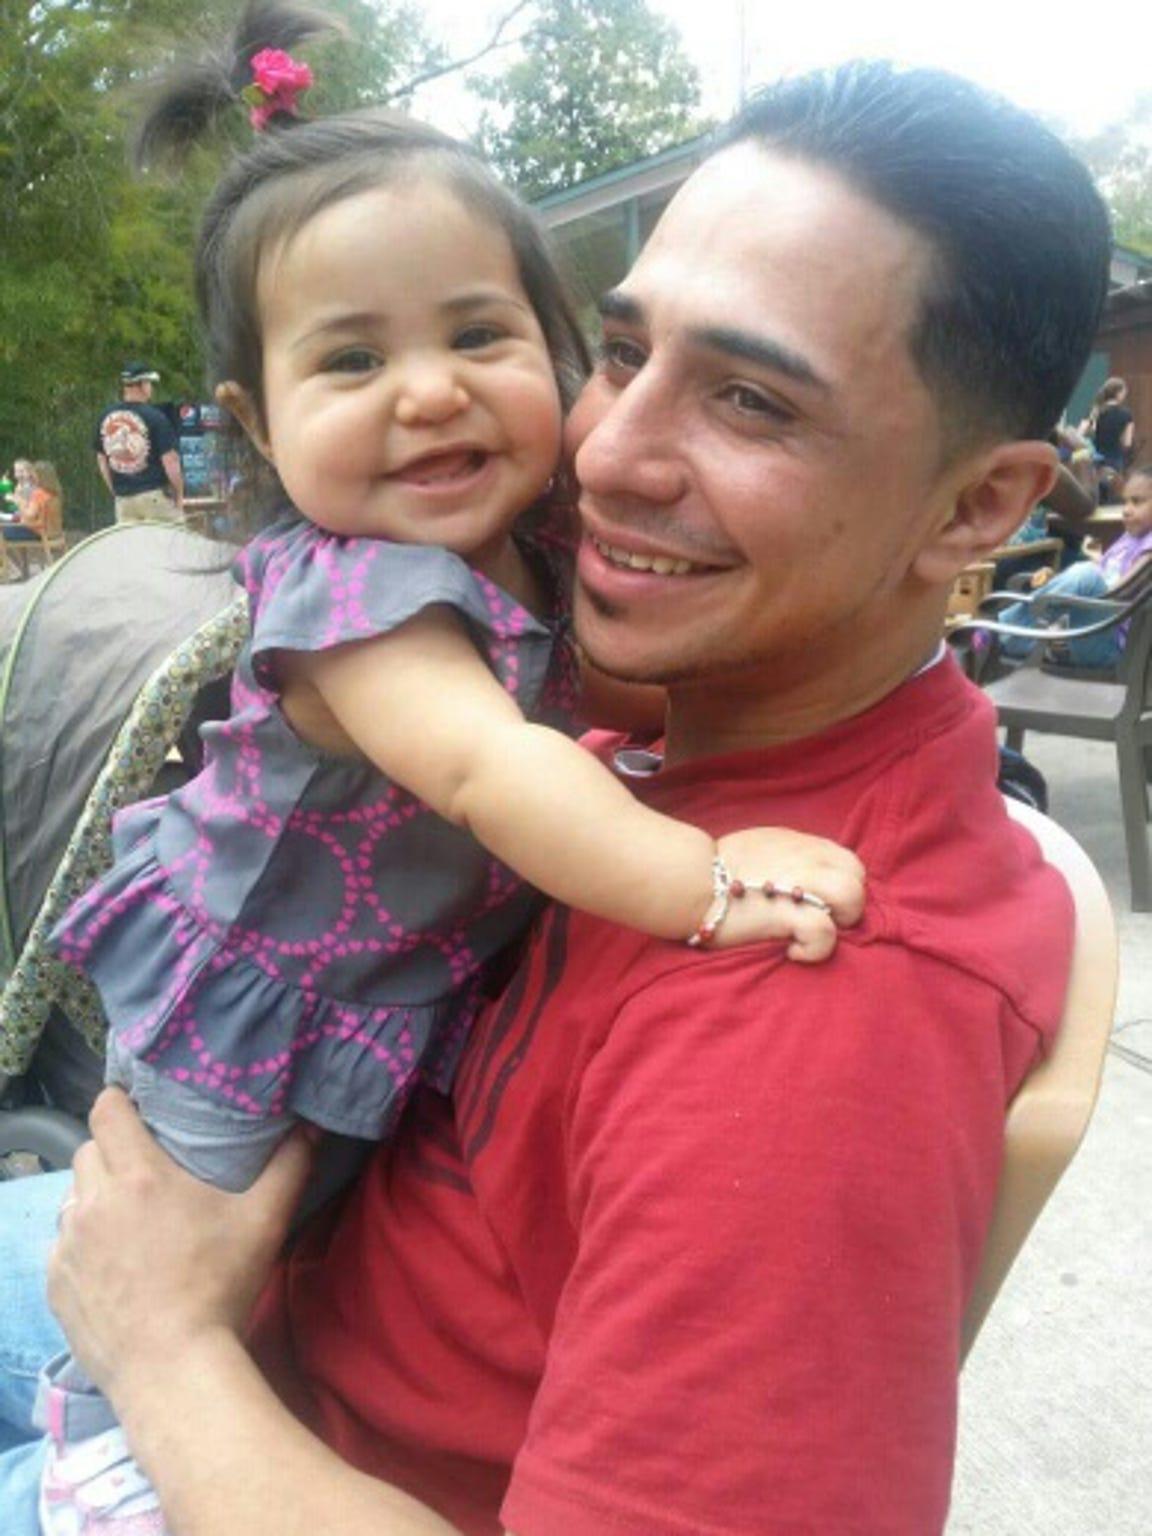 Norman Velez and daughter Skylar, now 4.